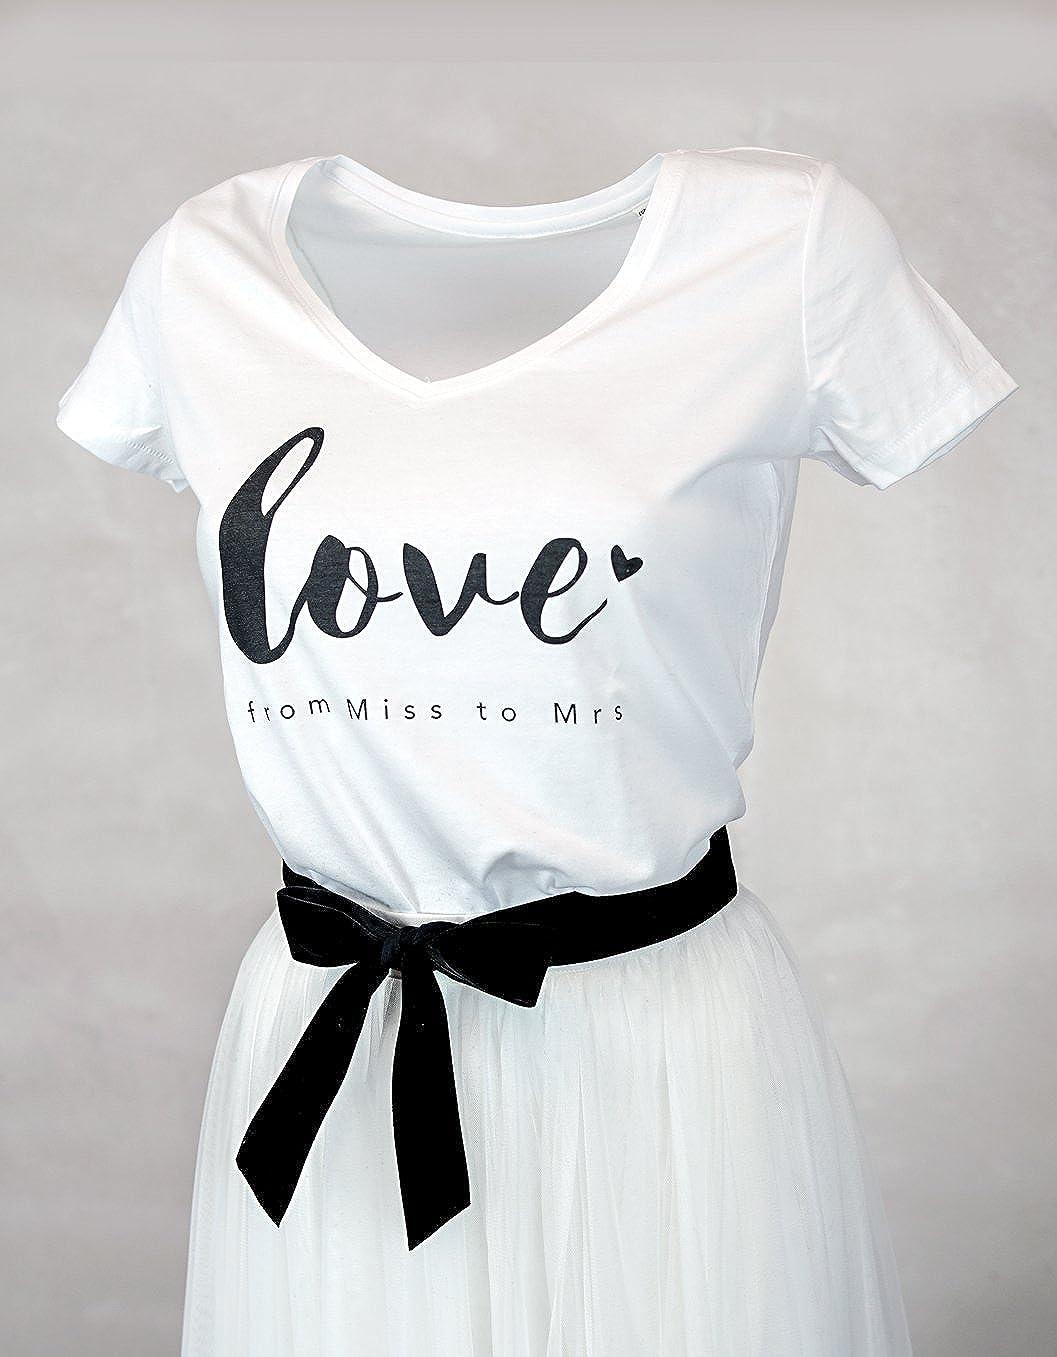 Constant Love/® Damen T-Shirt Braut Love from Miss to Mrs Offwhite Warm Wei/ß Junggesellen Abschied Flitterwochen Hochzeit Standesamt Outfit